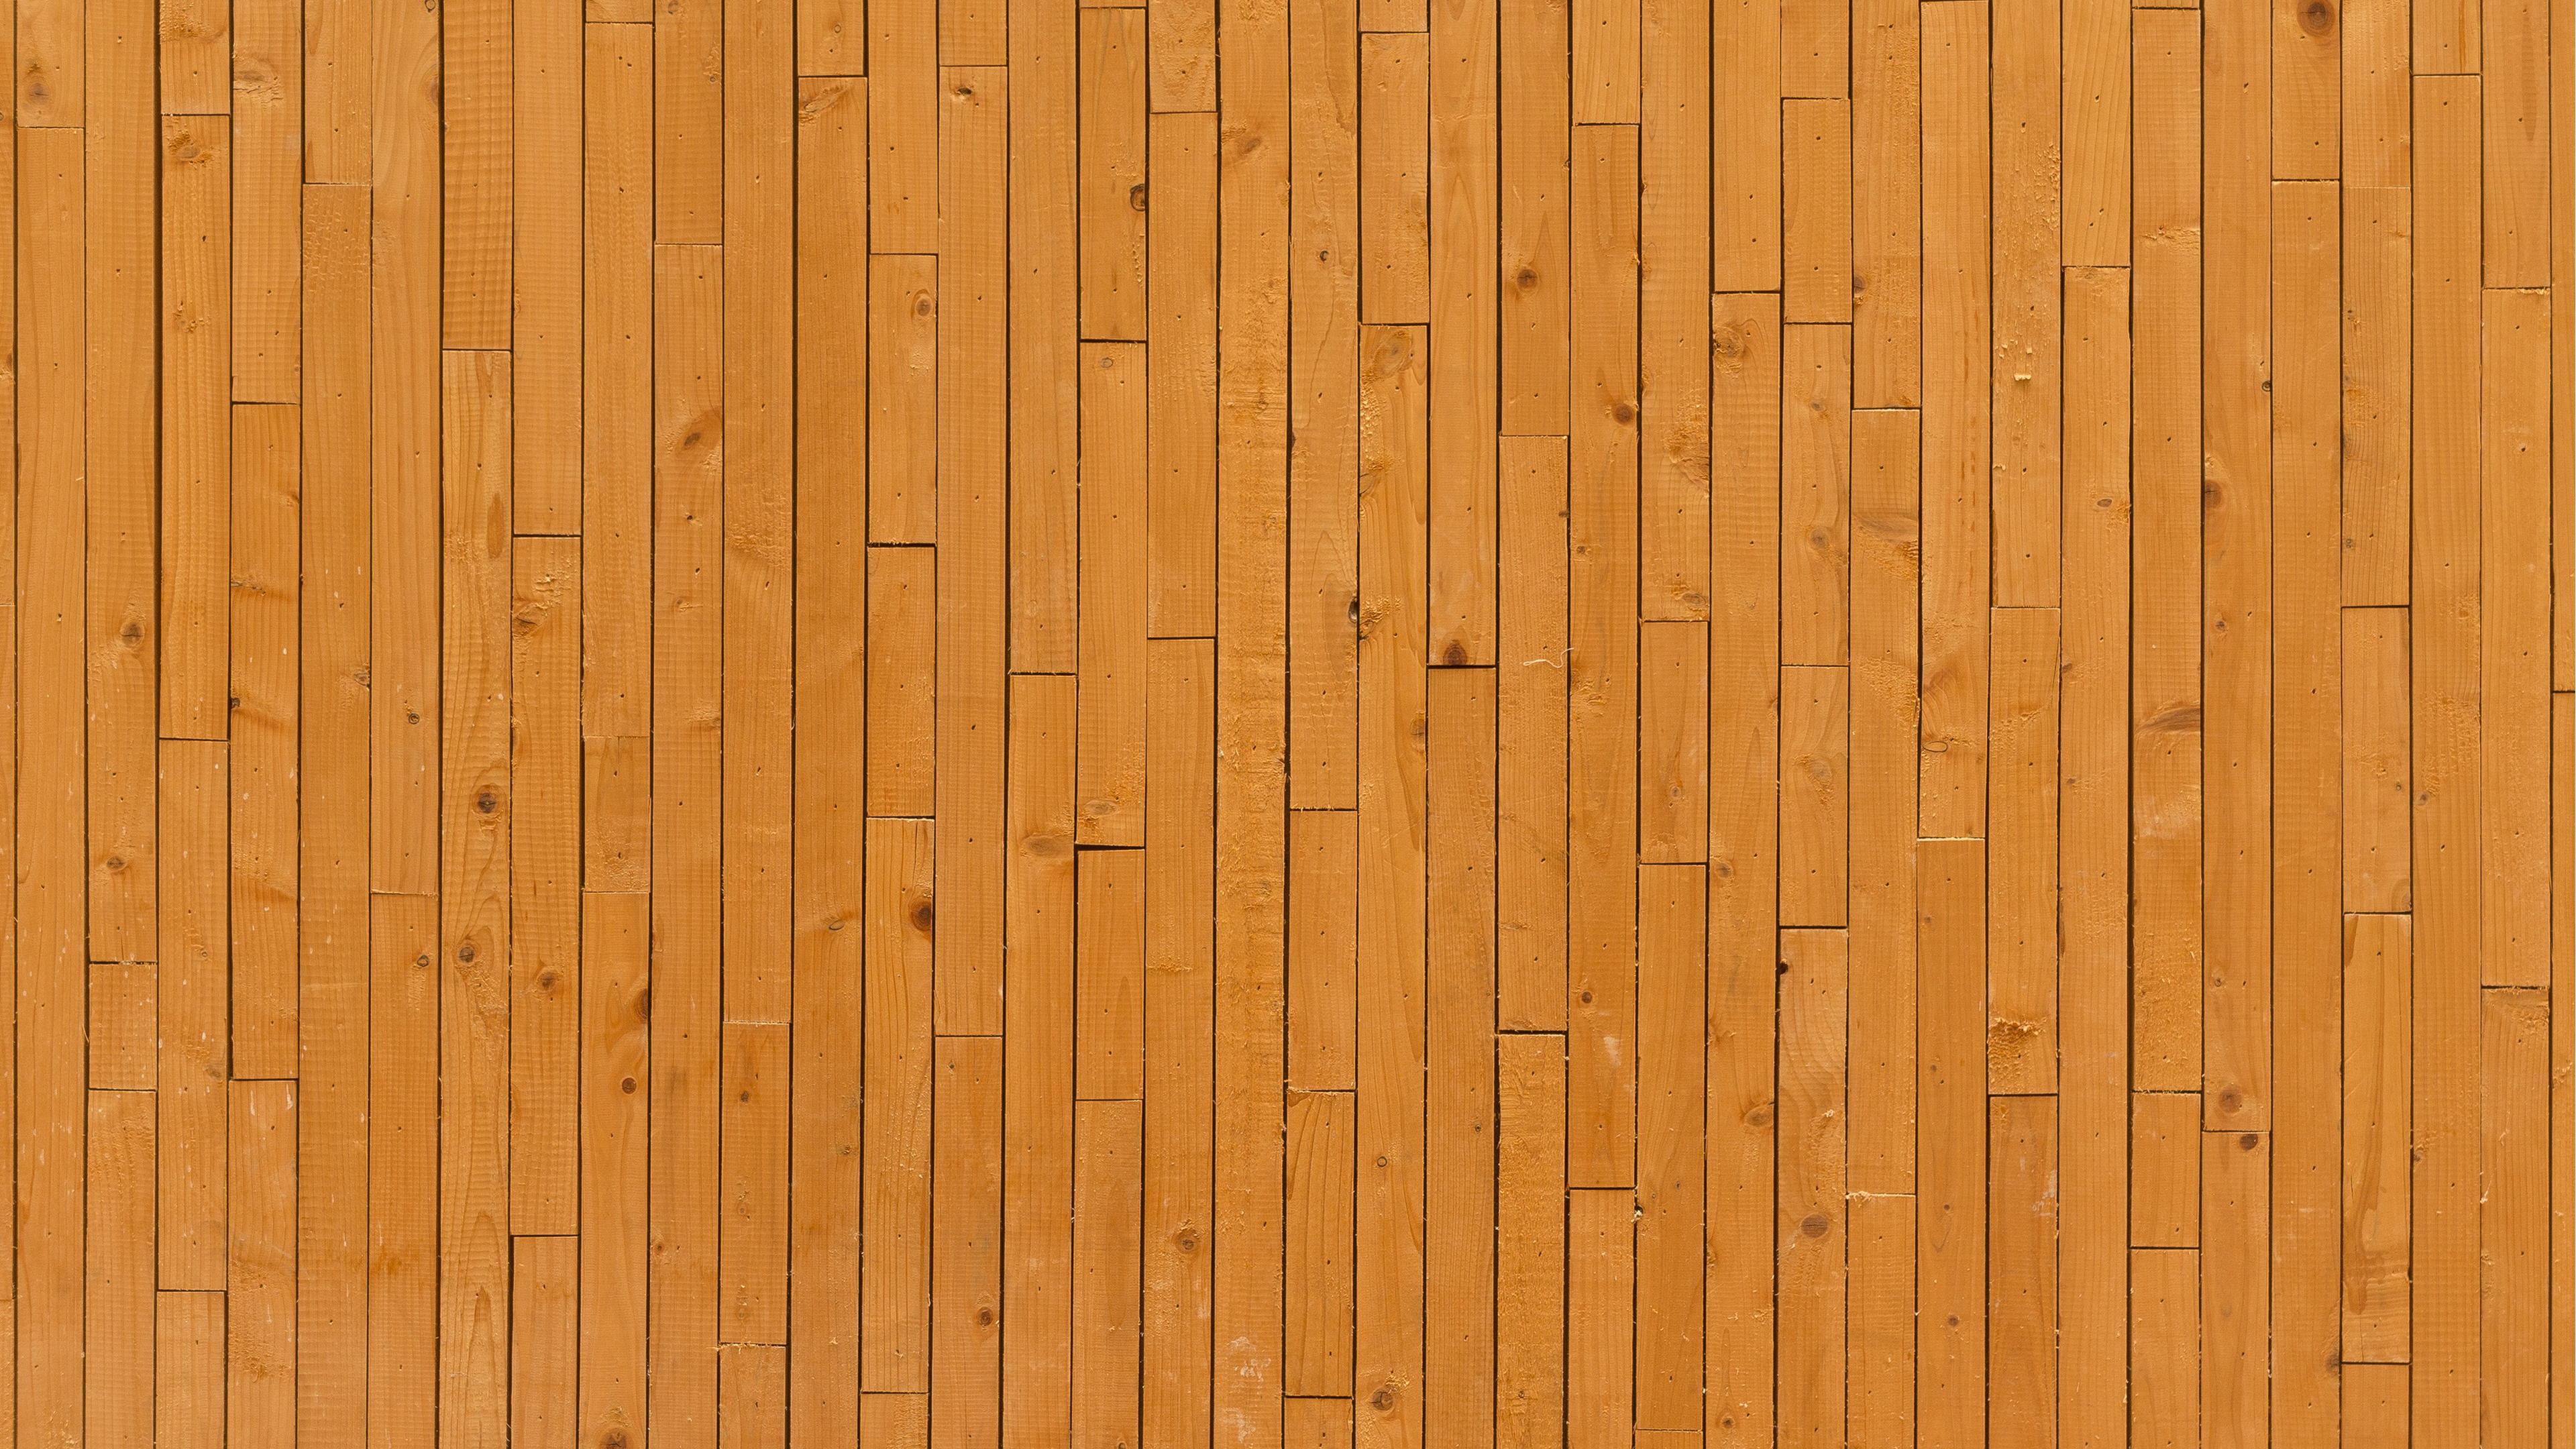 Sensational Wooden Planks Chromebook Wallpaper Interior Design Ideas Helimdqseriescom